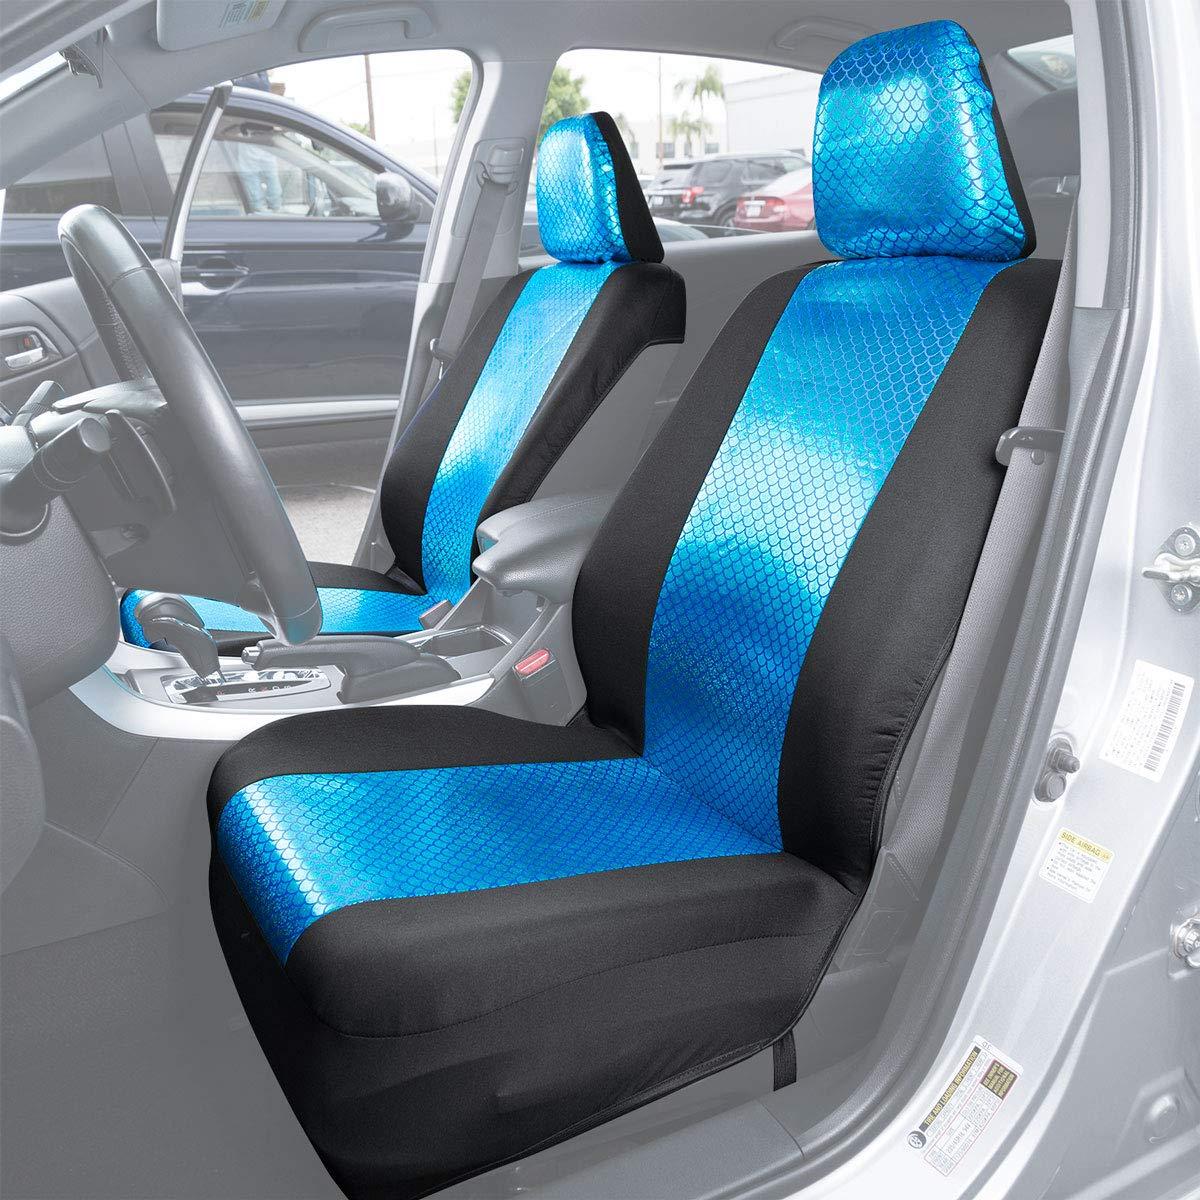 GGBAILEY D4348A-S1A-BK-LP Custom Fit Car Mats for 2002 2004 Ford Focus ZX3 Black Loop Driver Passenger /& Rear Floor 2003